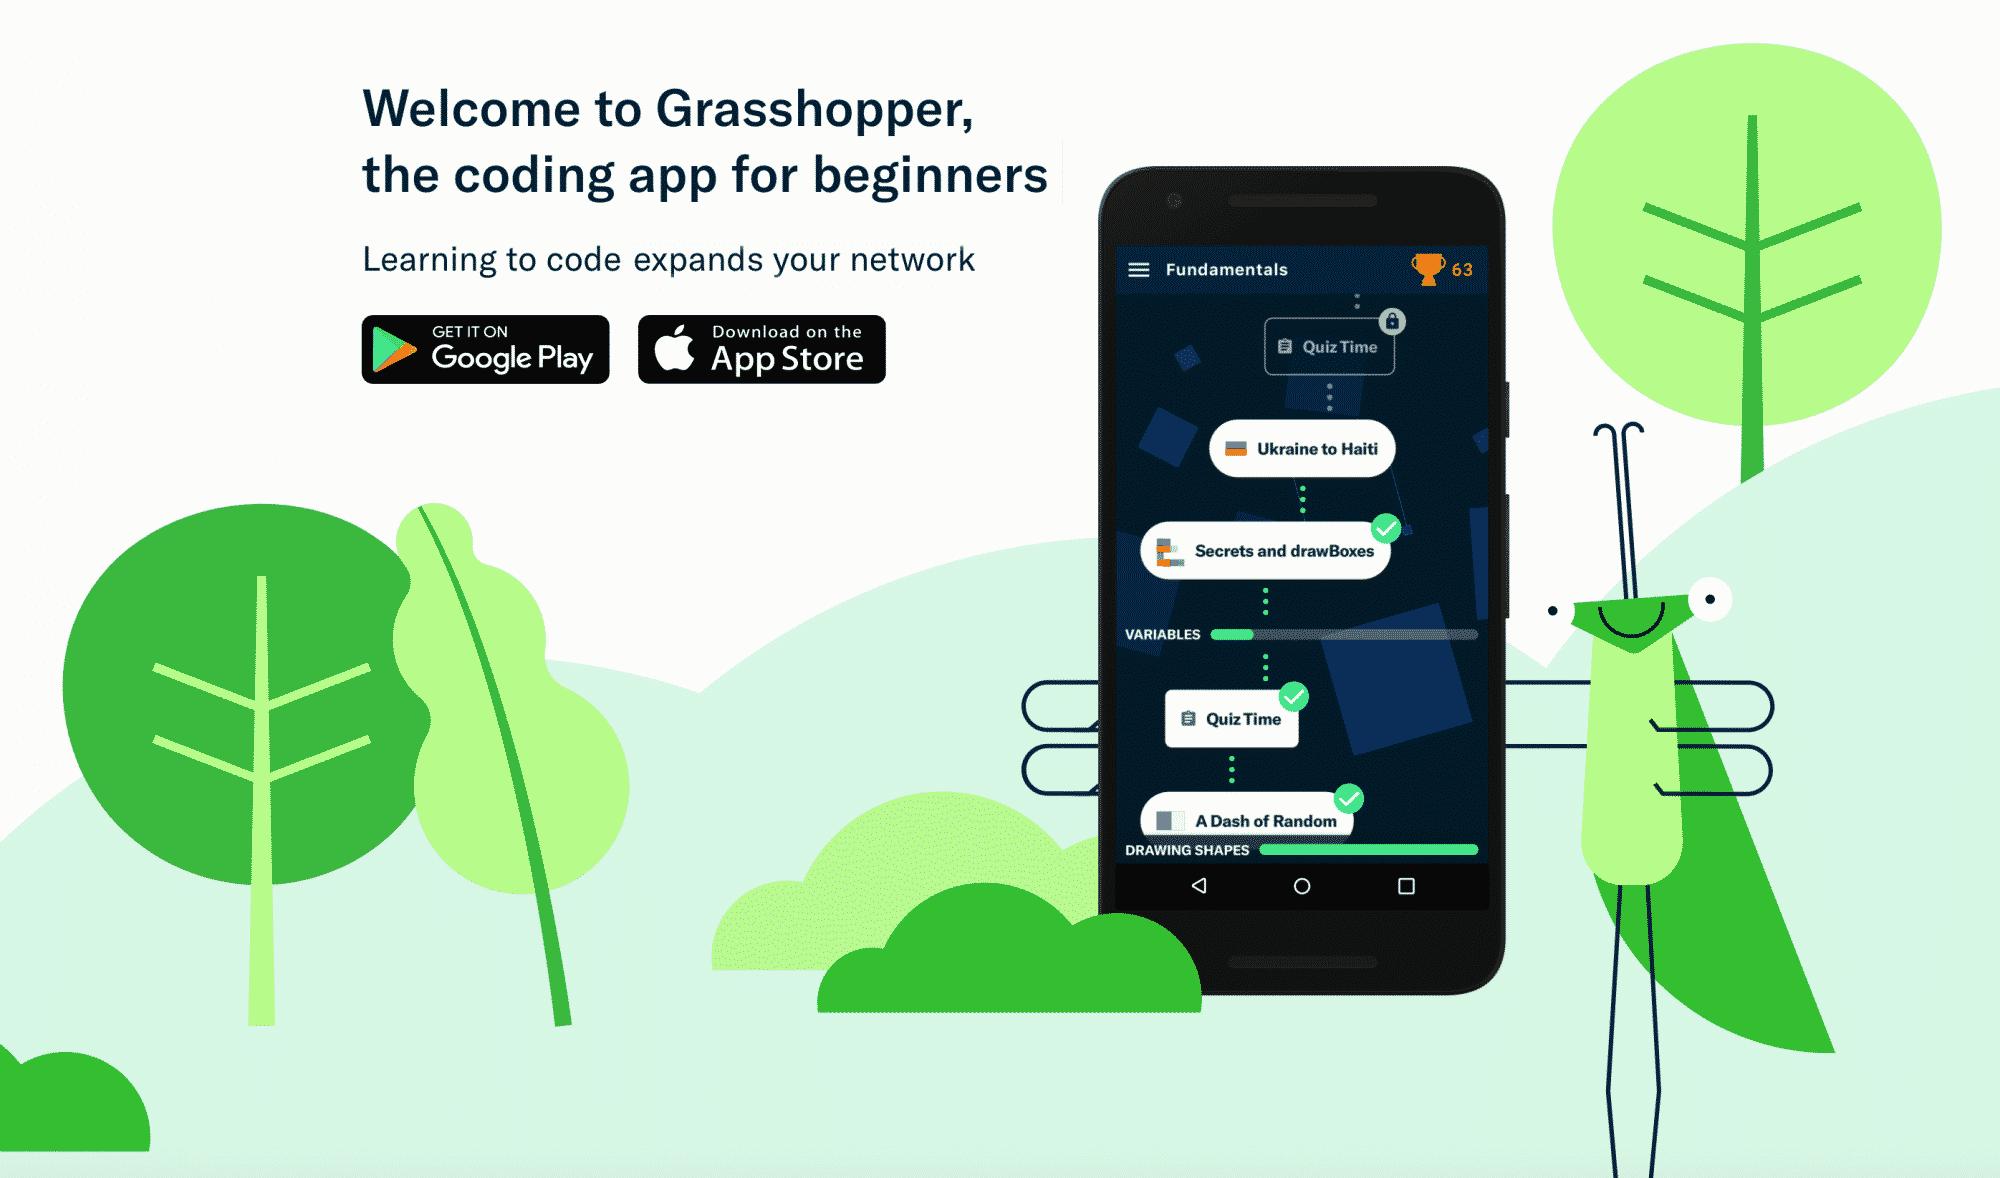 grasshopper une app sign e google pour apprendre coder en javascript silicon. Black Bedroom Furniture Sets. Home Design Ideas